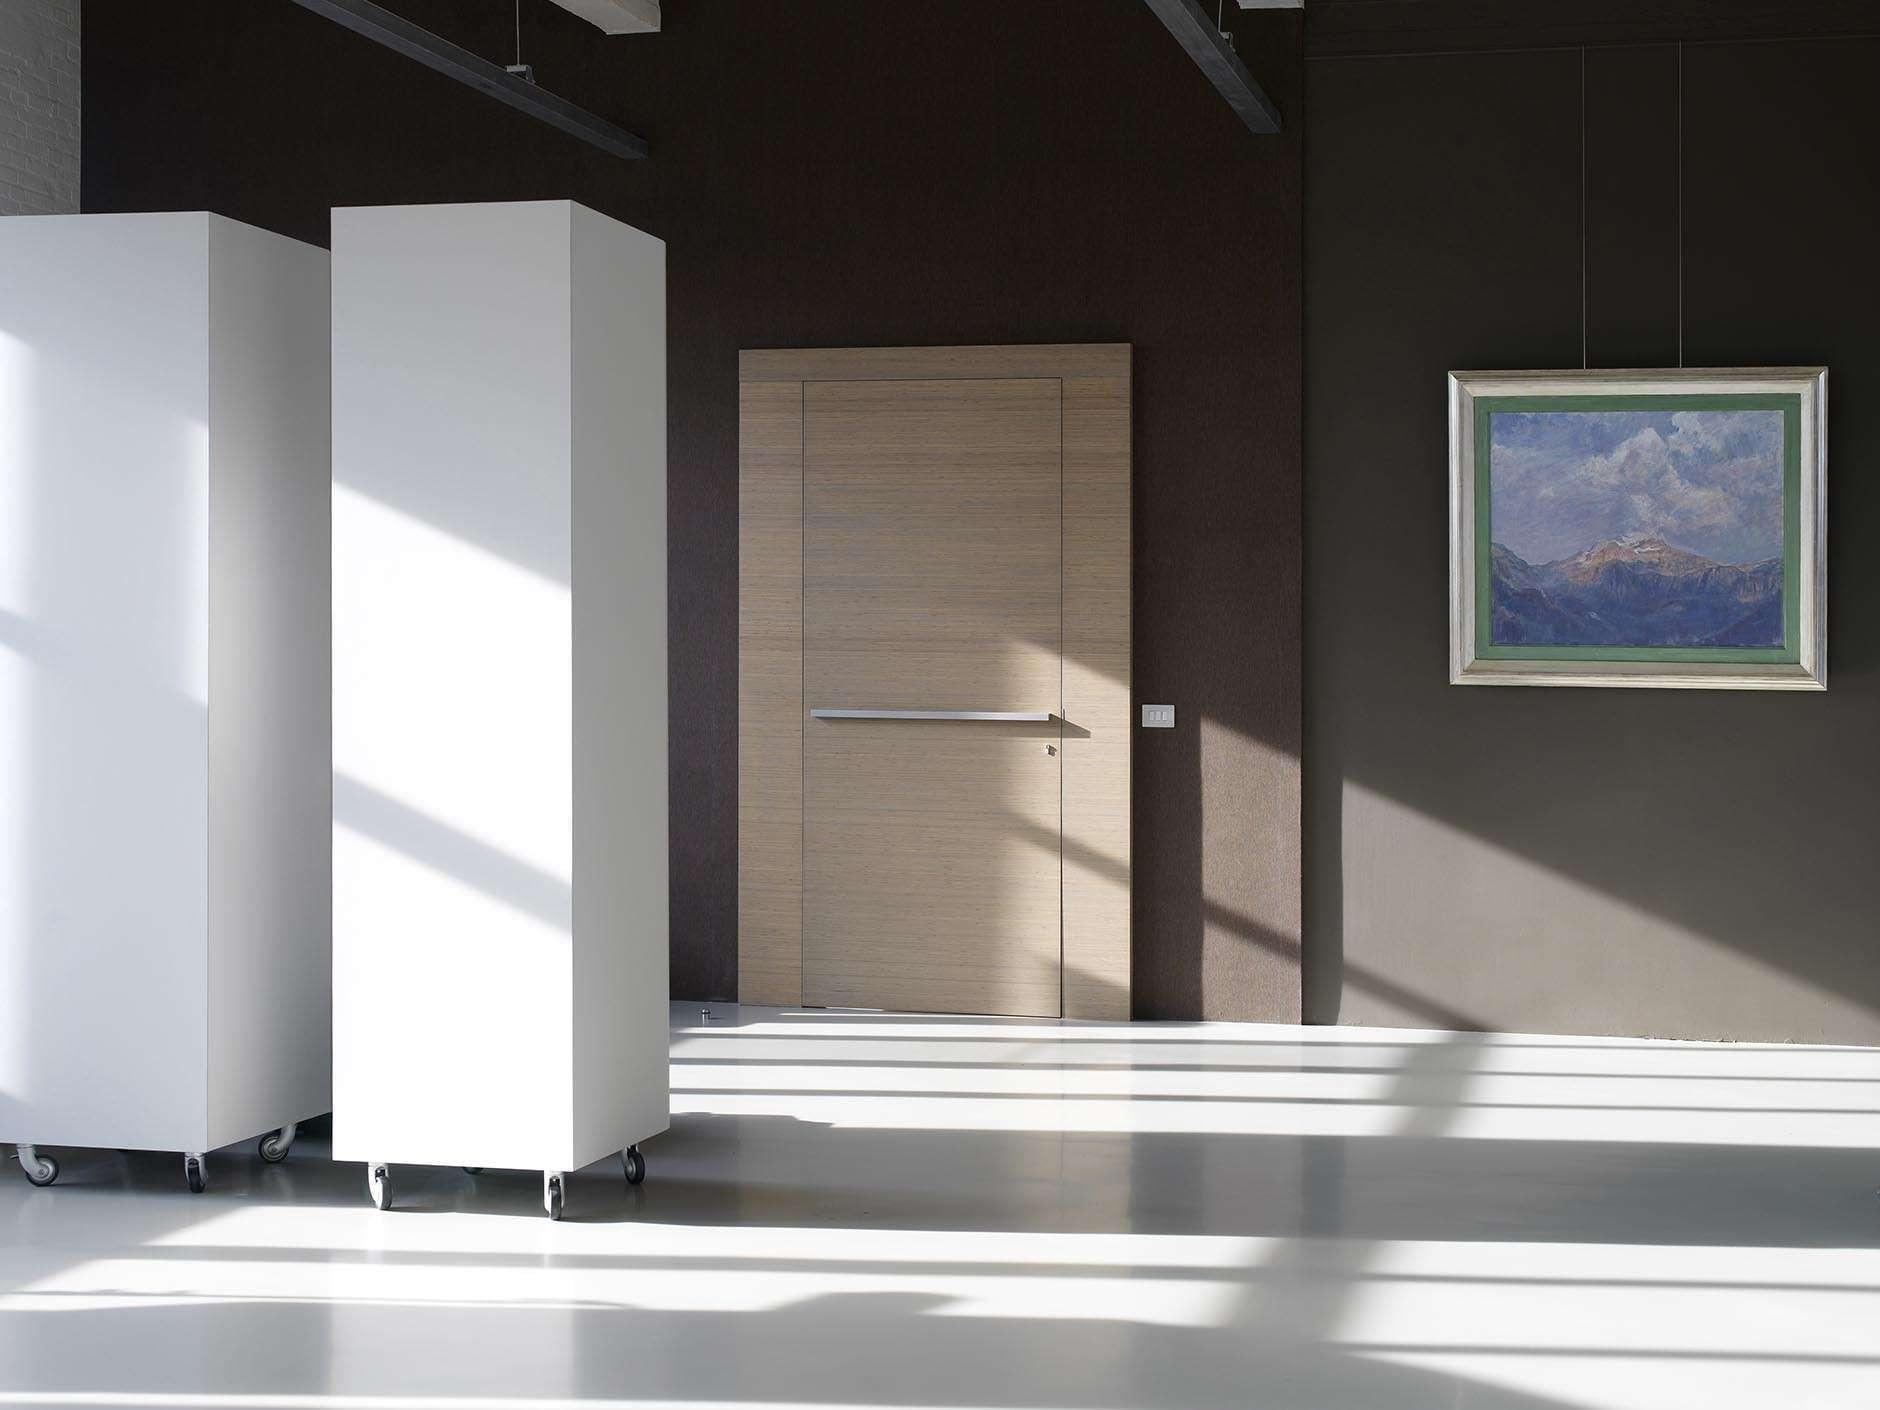 binnendeur-in-voorzetwand-strak